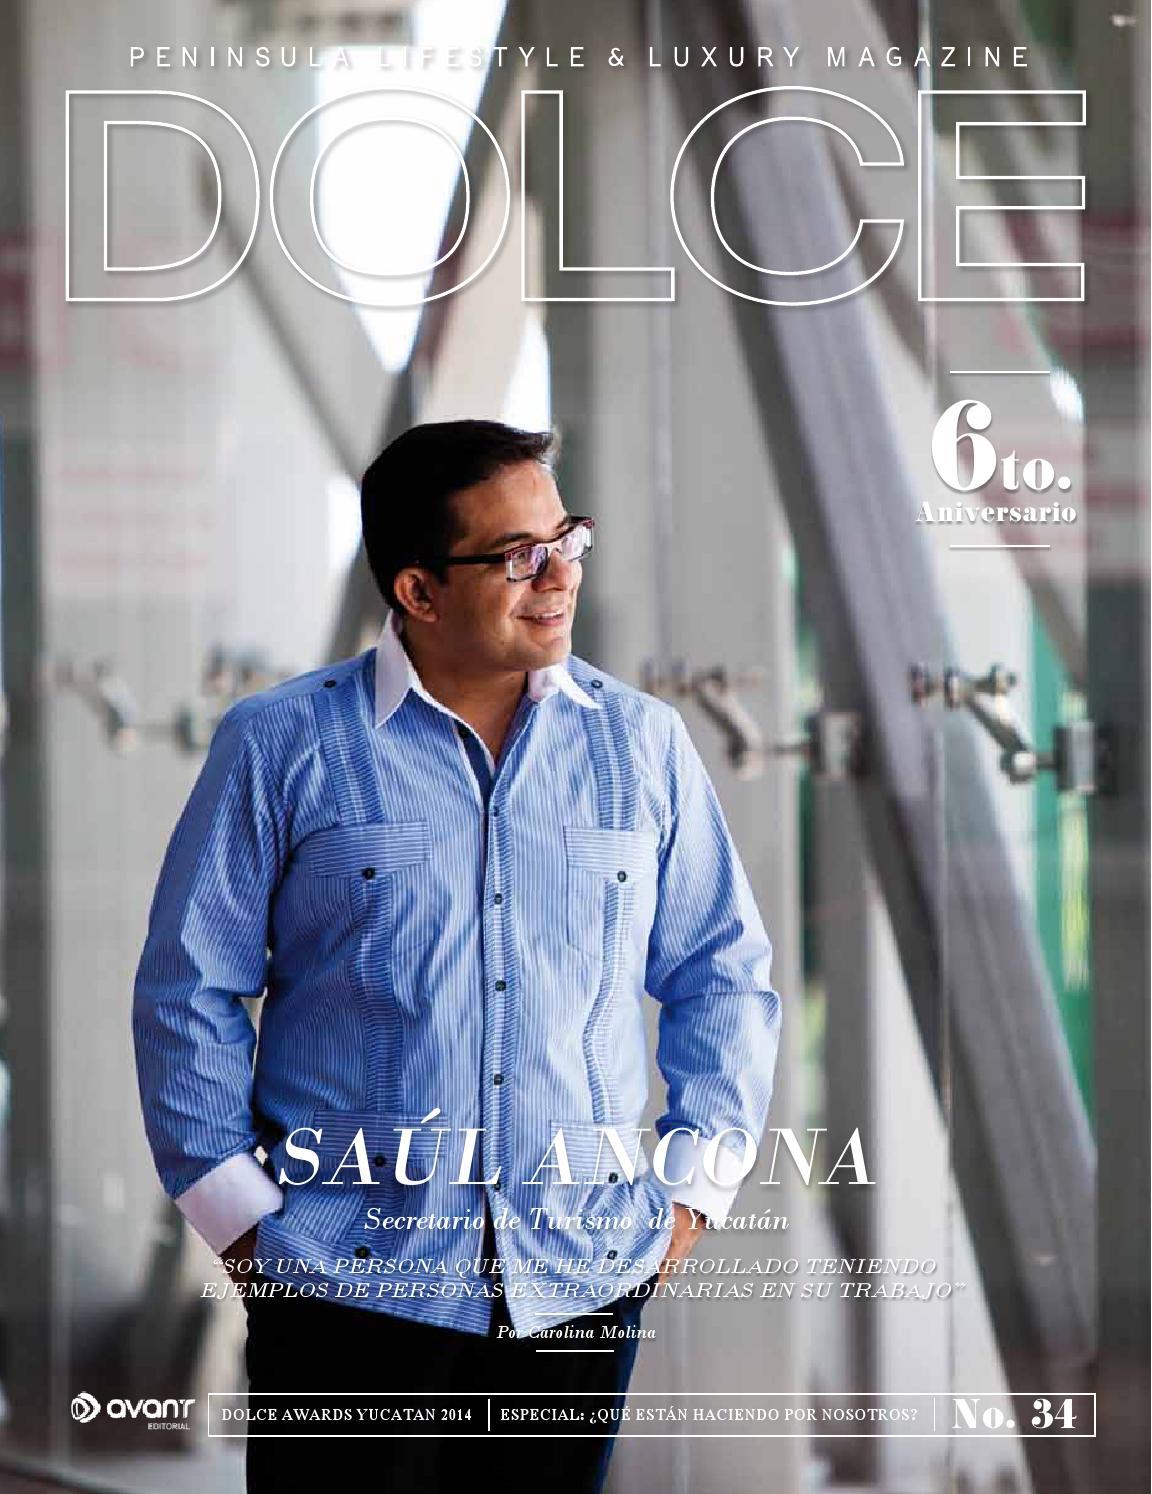 DOLCE magazine No.34 / 2014 \